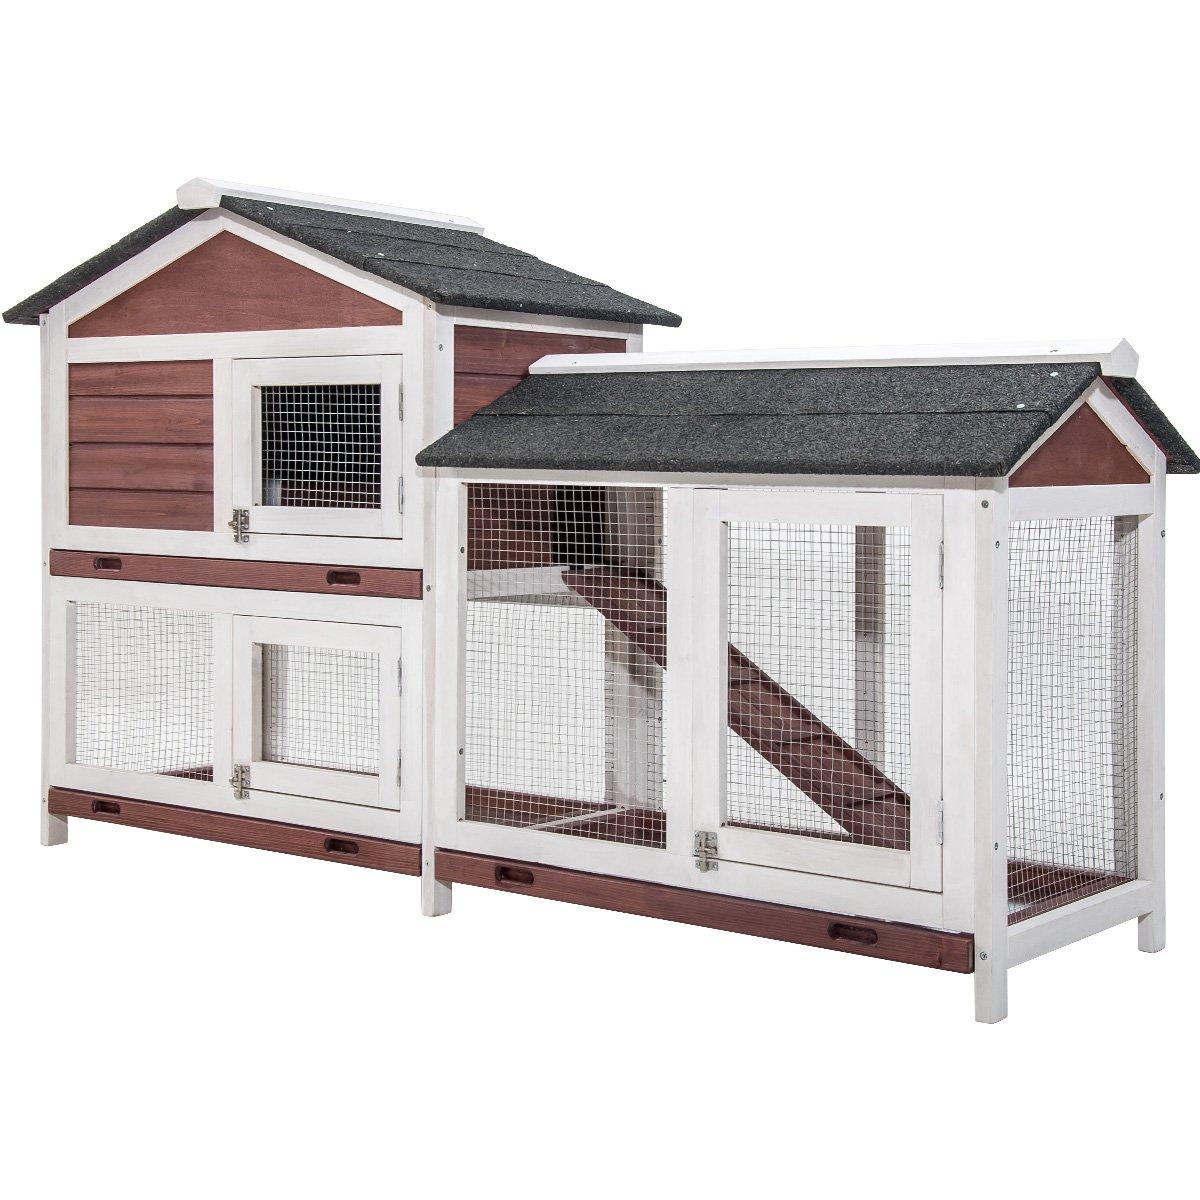 Purlove Pet Rabbit Hutch Wooden House Chicken Coop for Small Animals (Rabbit Hutch #4) by PURLOVE